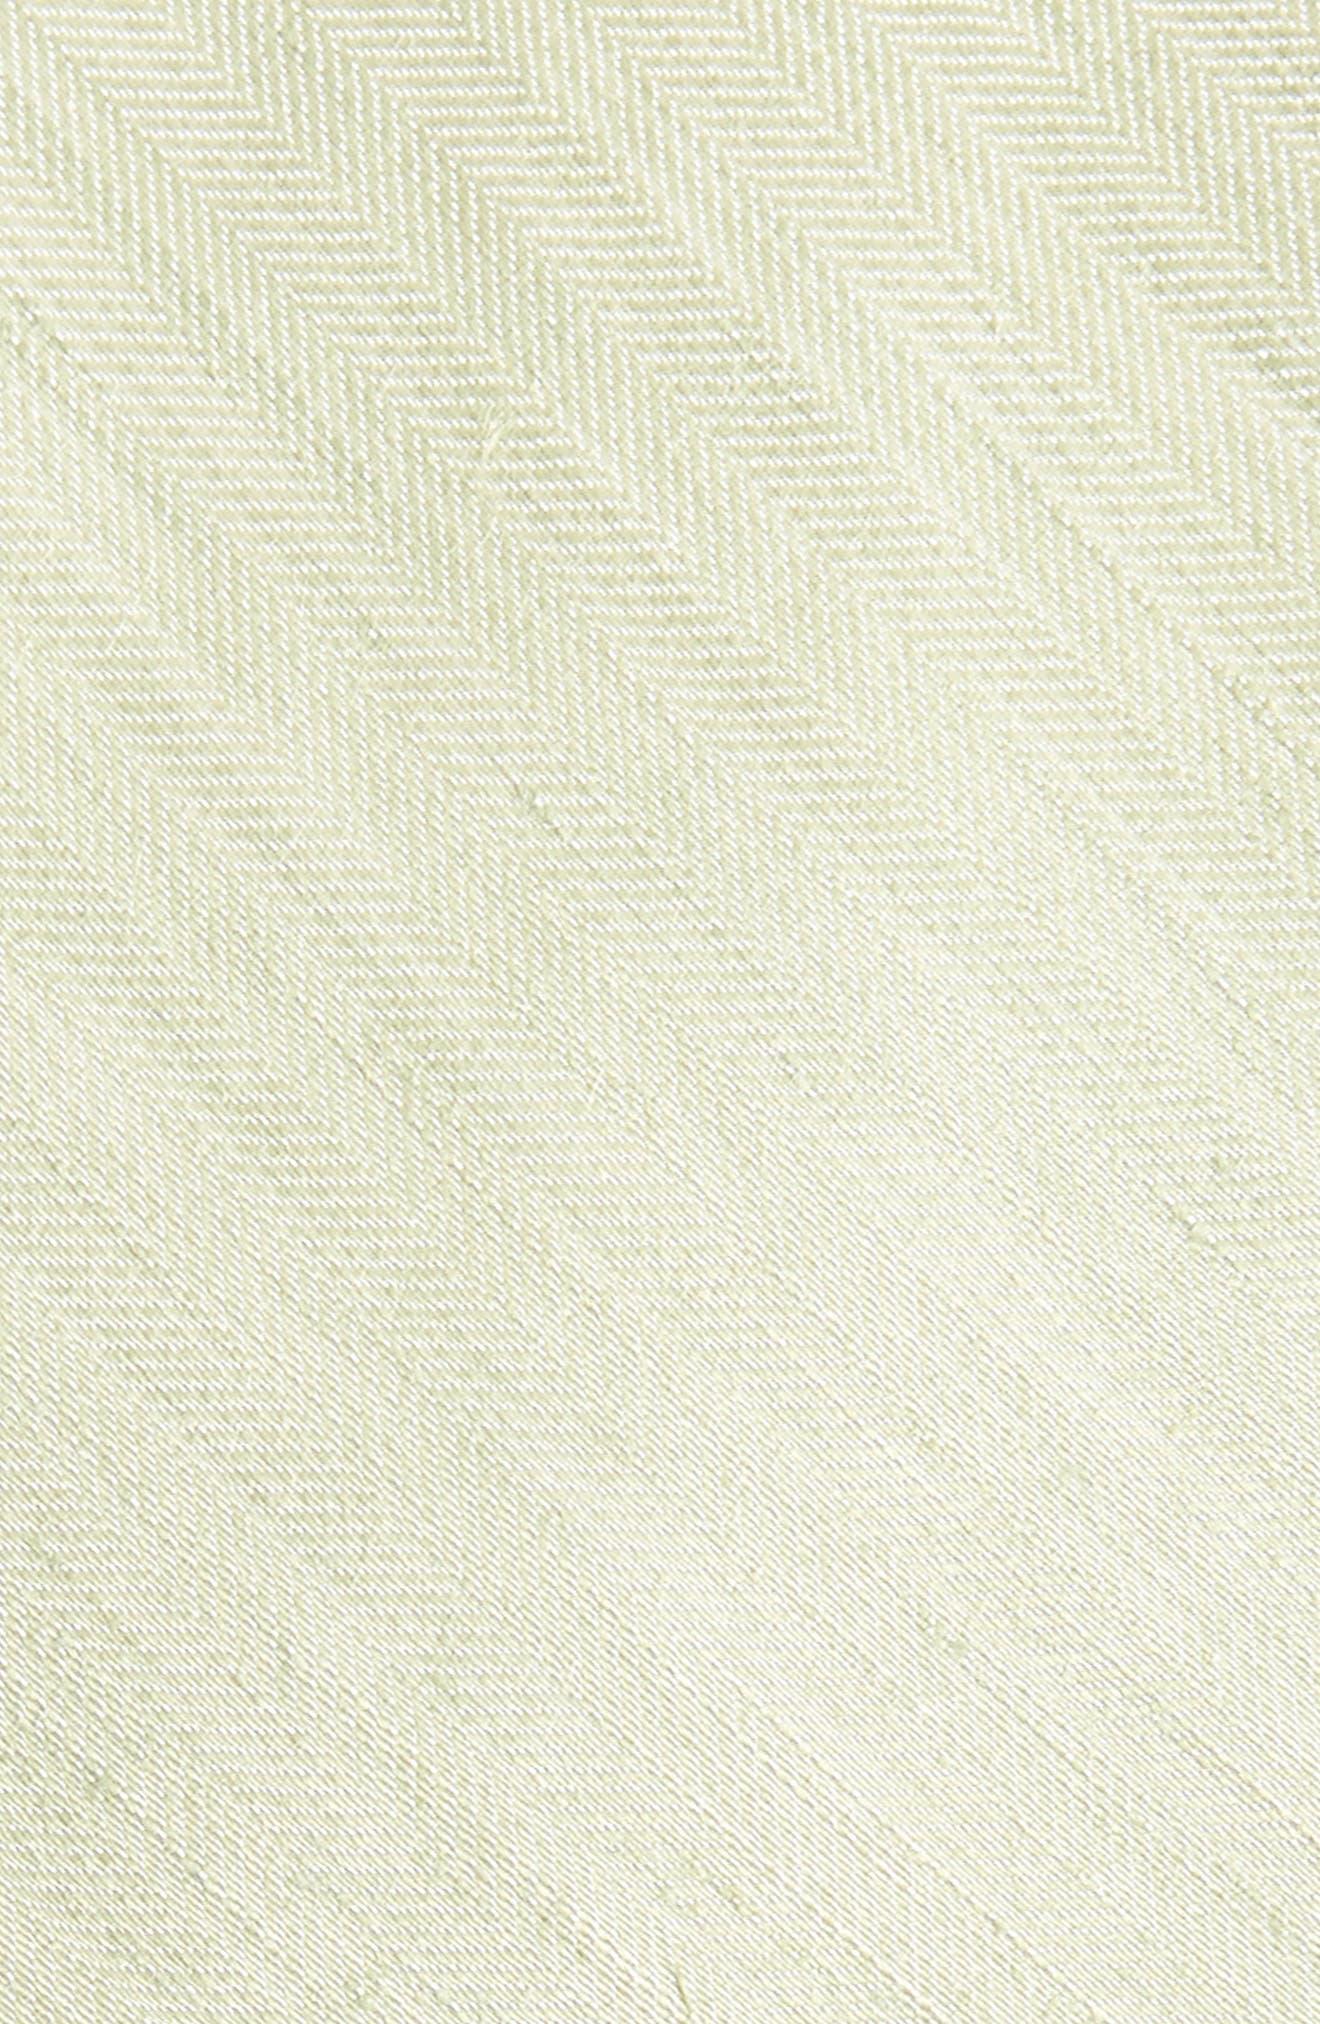 Linen Row Linen & Silk Tie,                             Alternate thumbnail 2, color,                             Sage Green